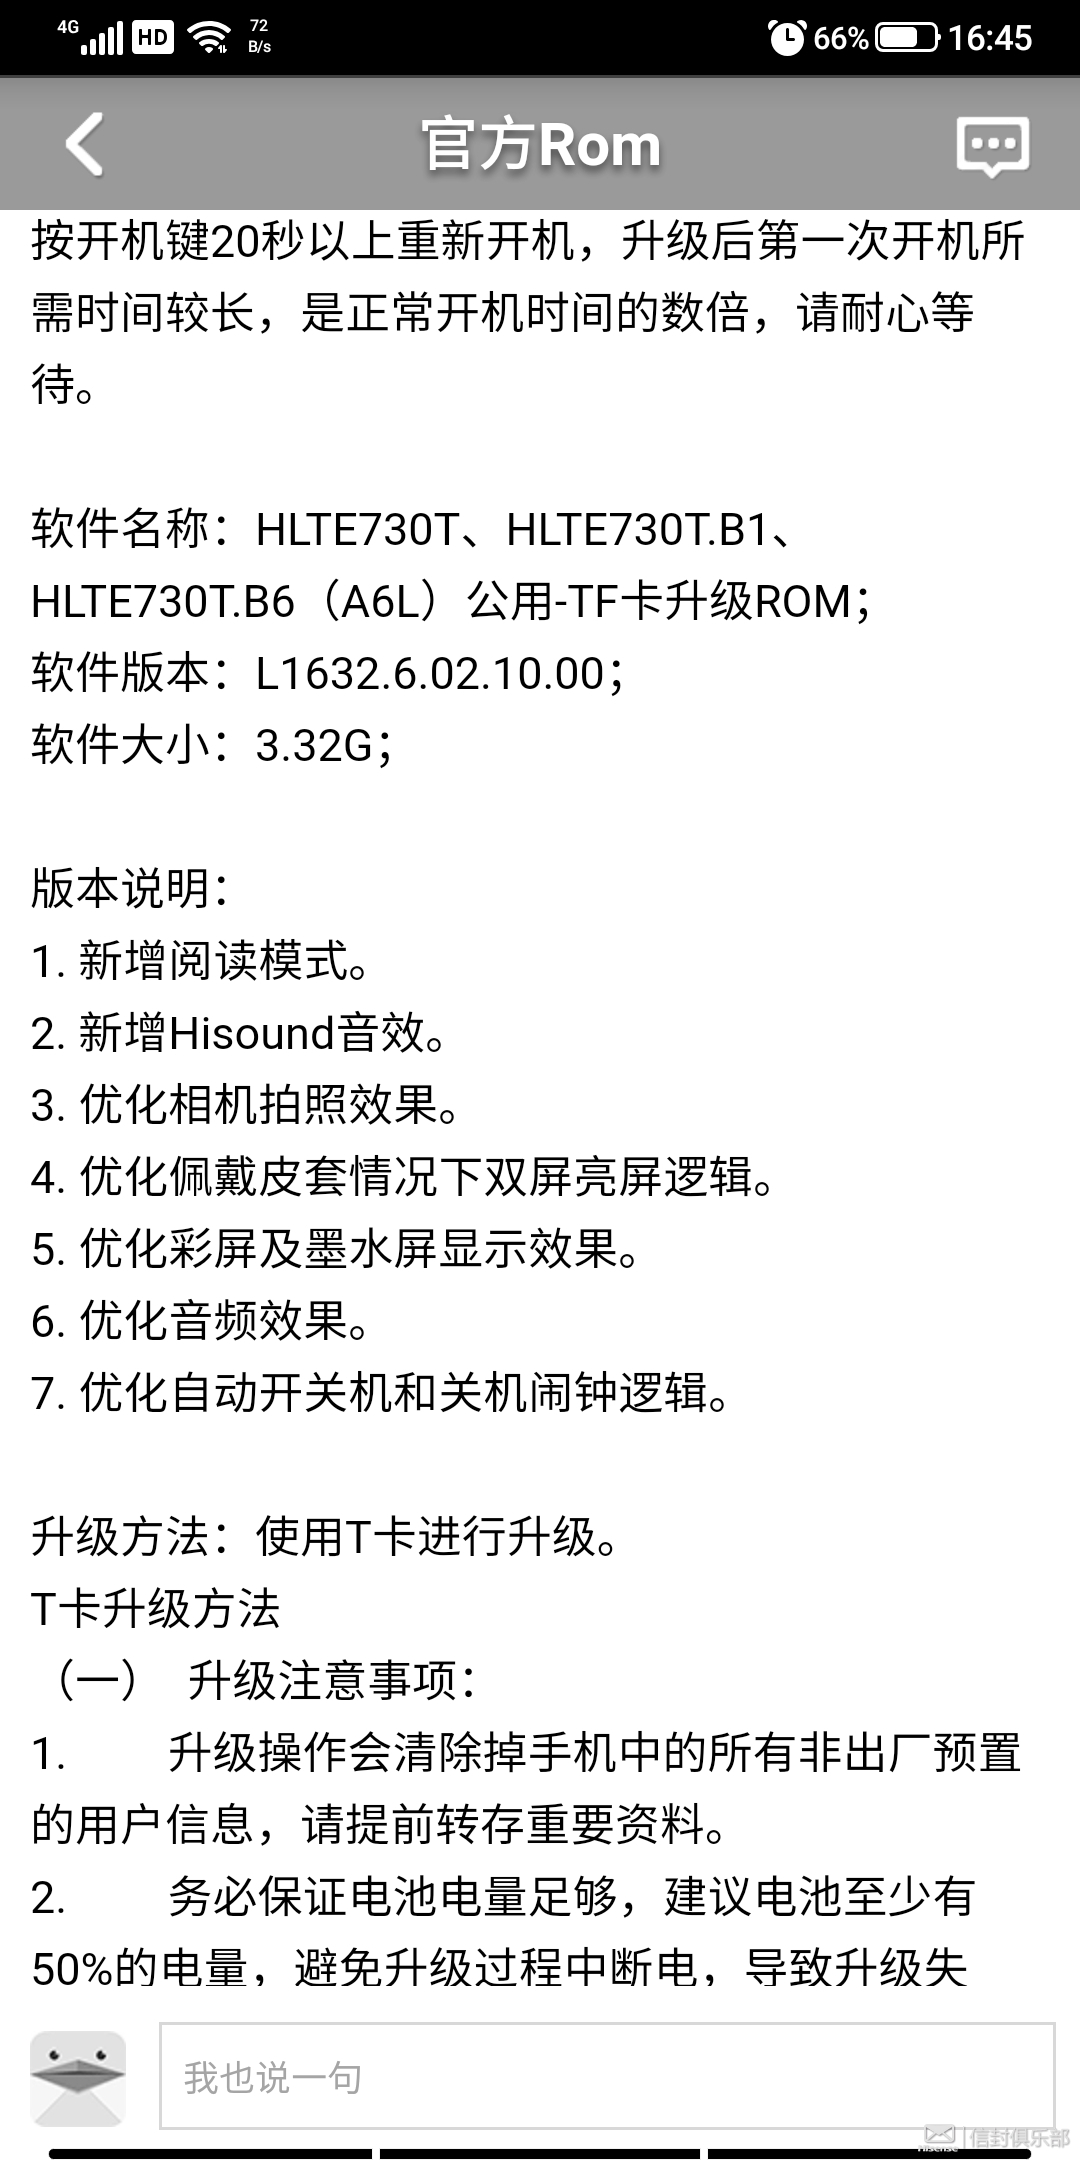 Screenshot_20201109_164534174_信封俱乐部.jpg